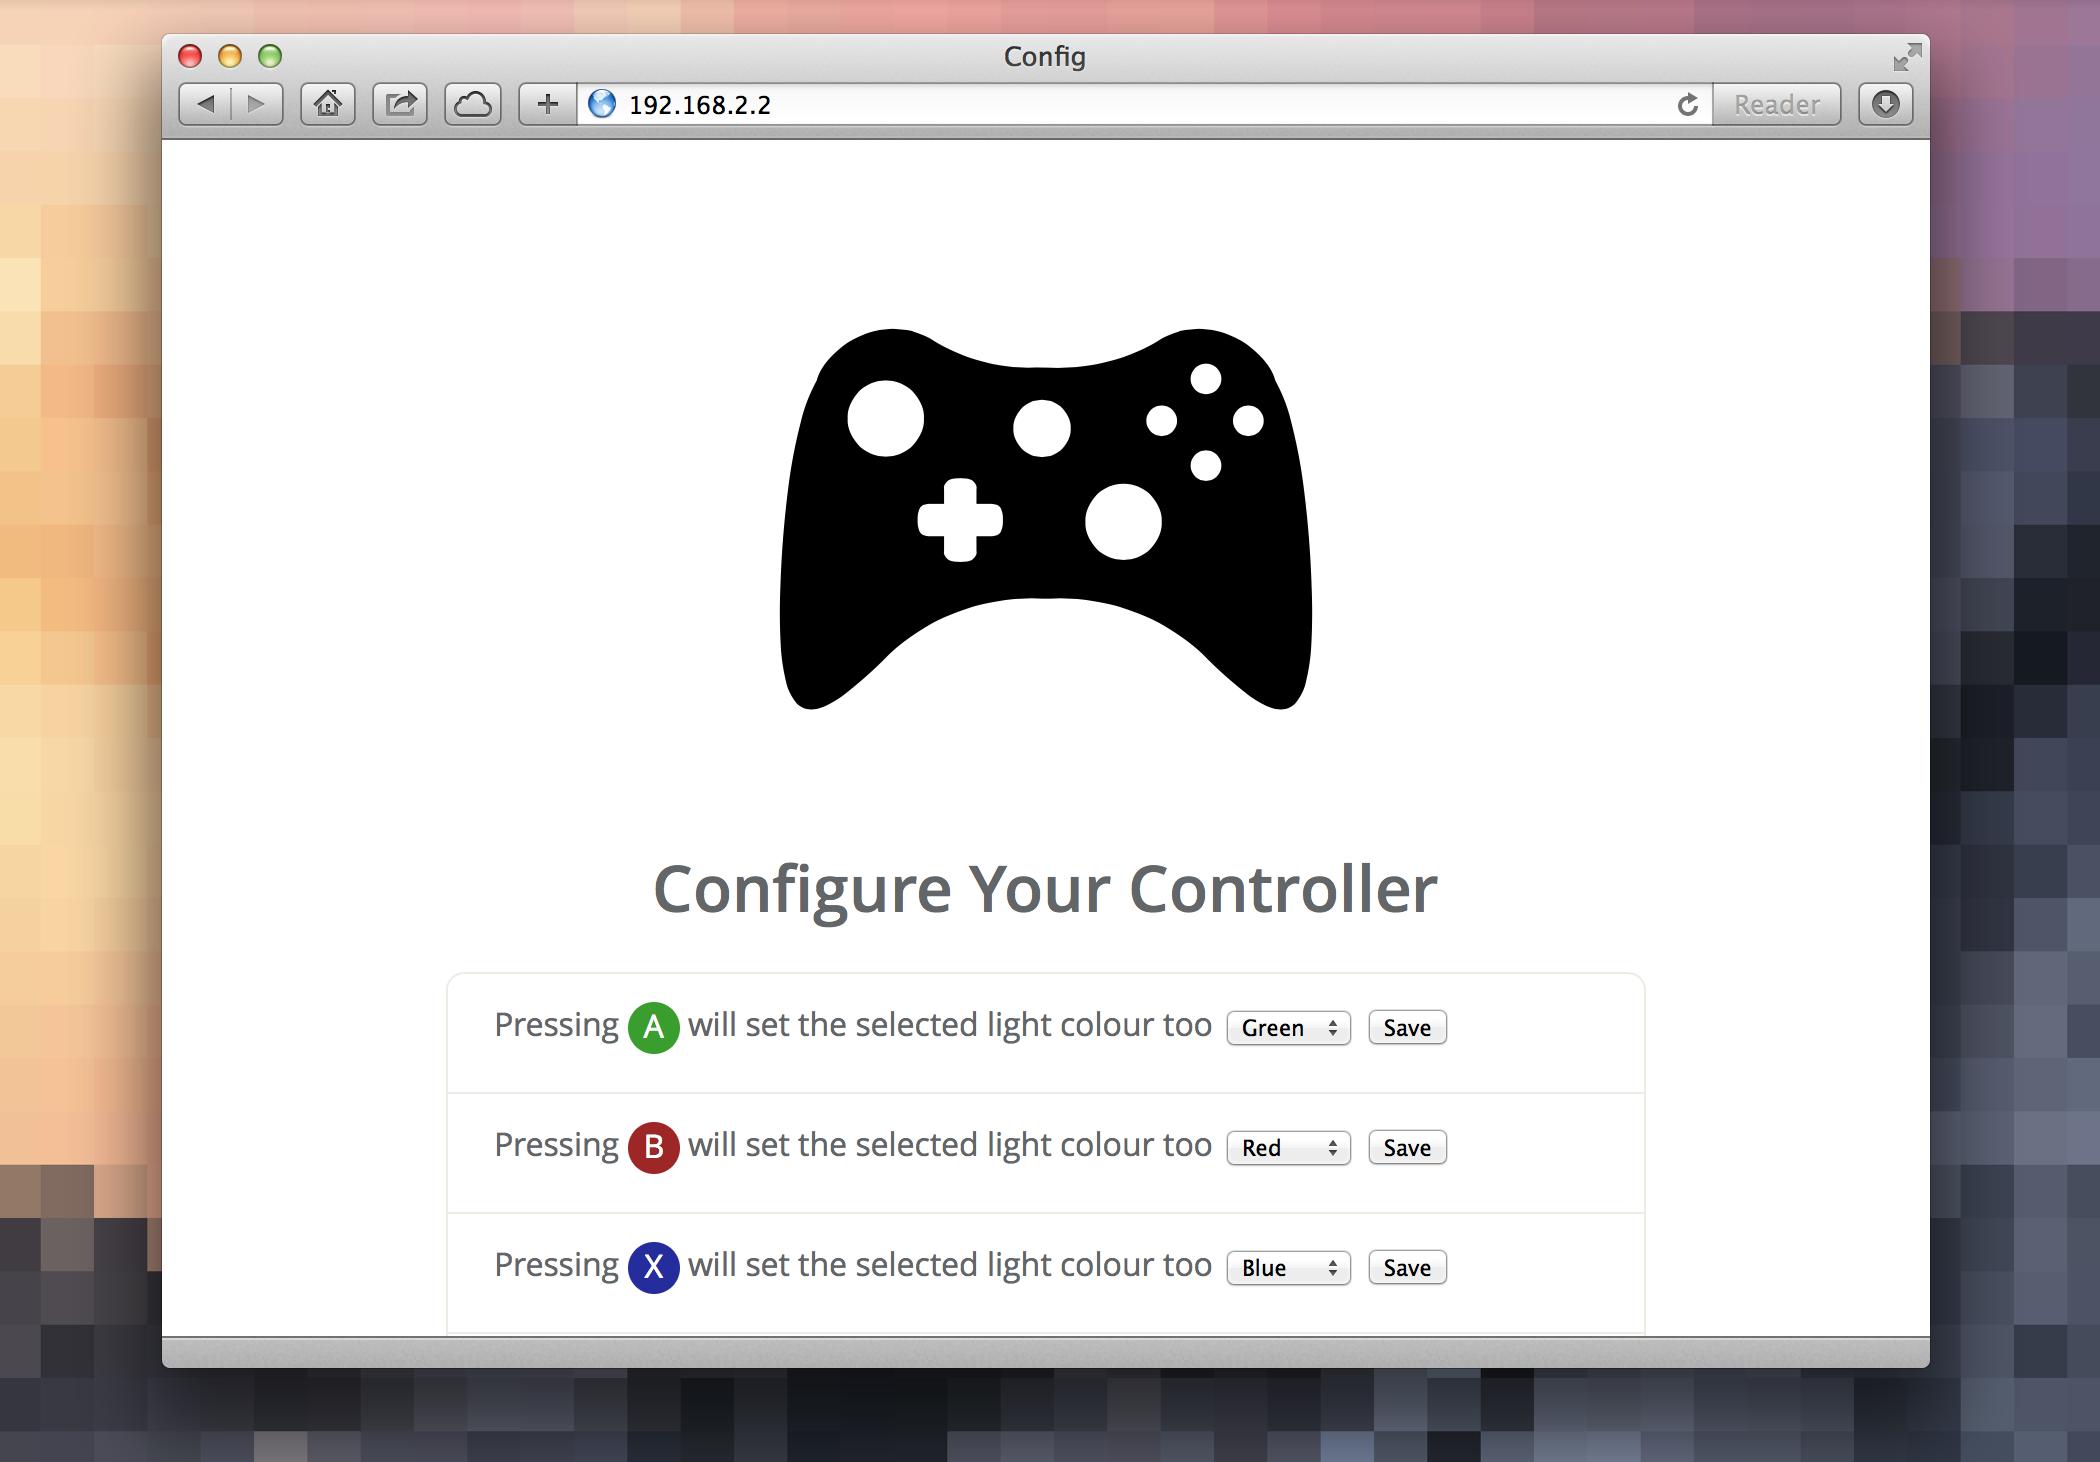 Configuration UI screenshot.